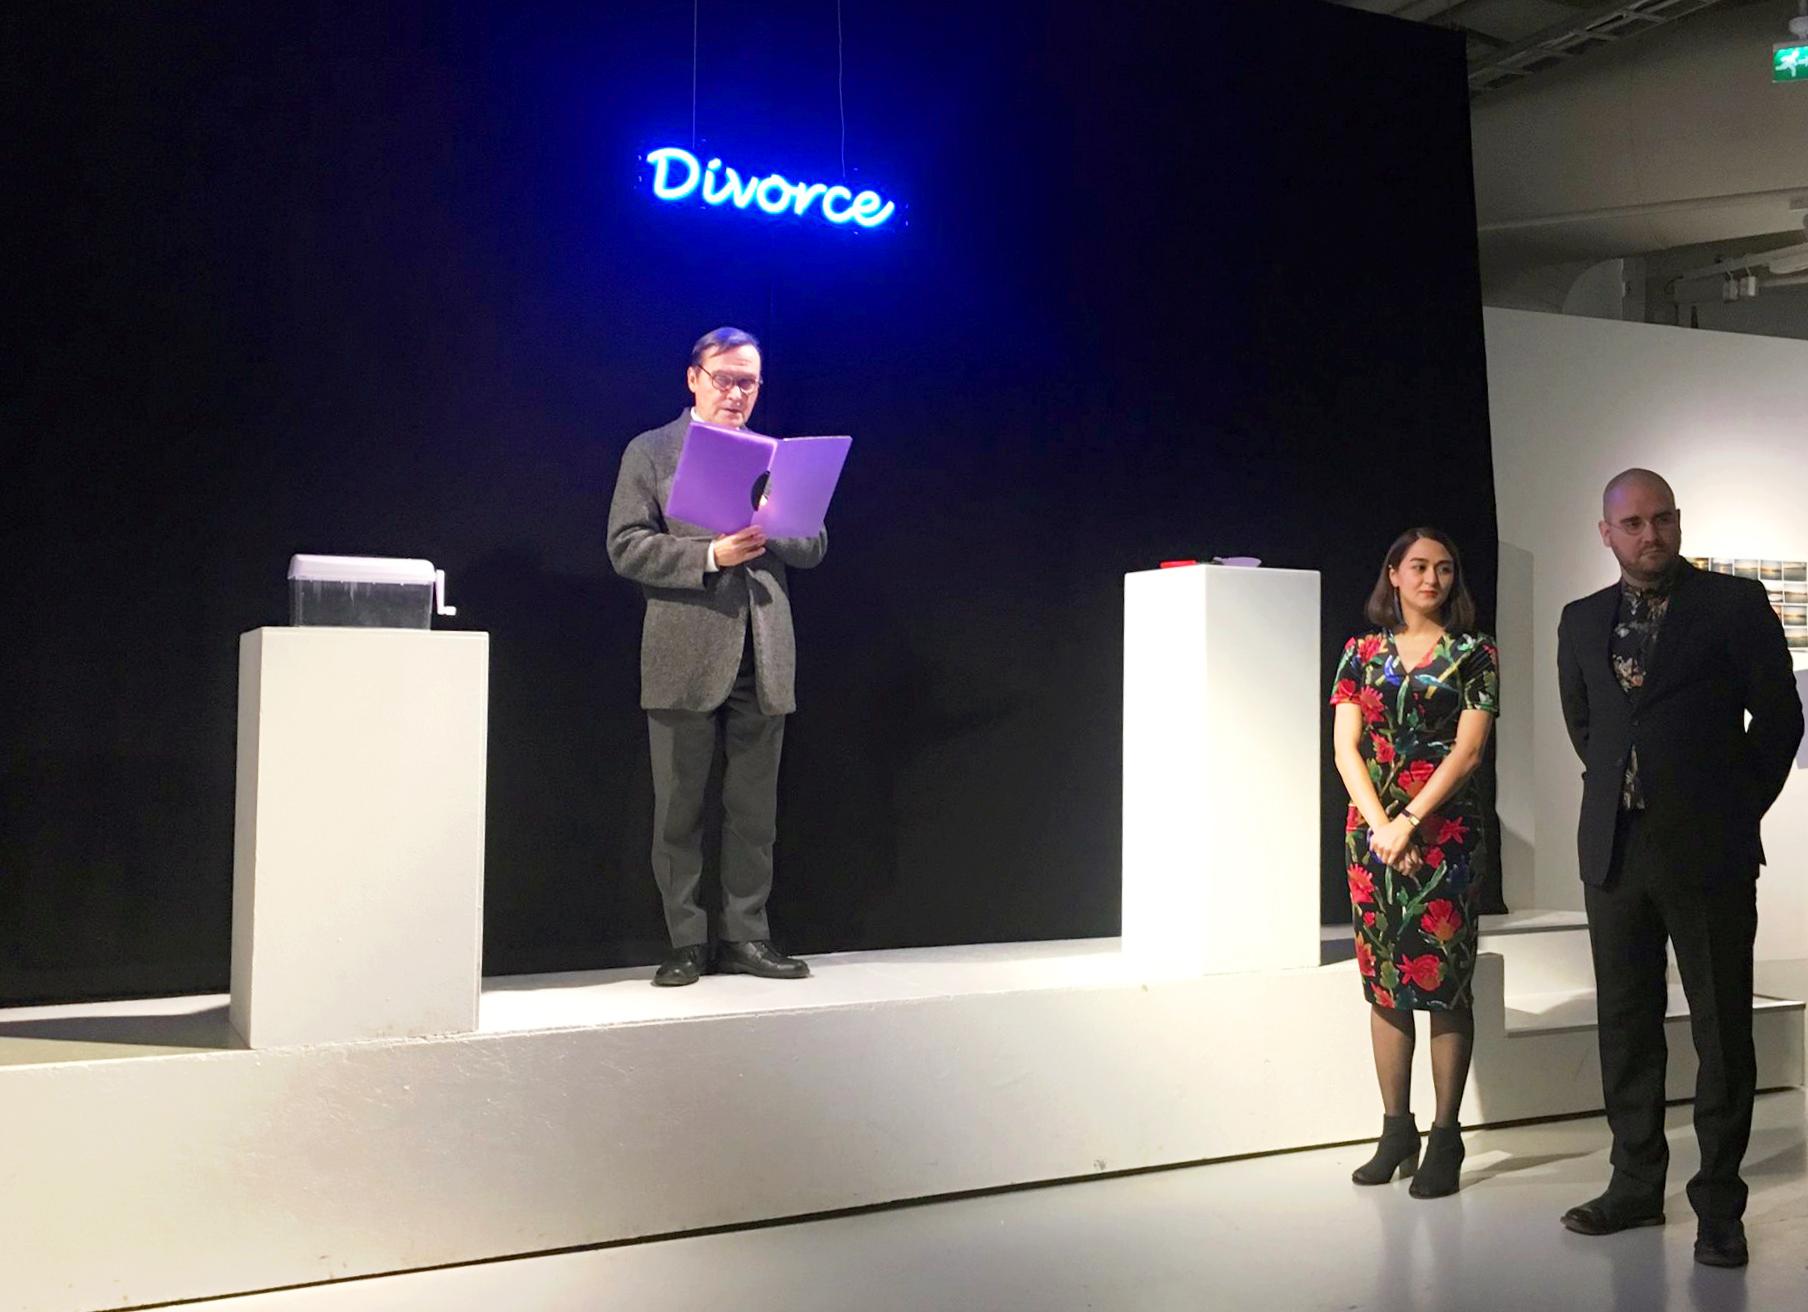 Divorce Ceremony1.jpg